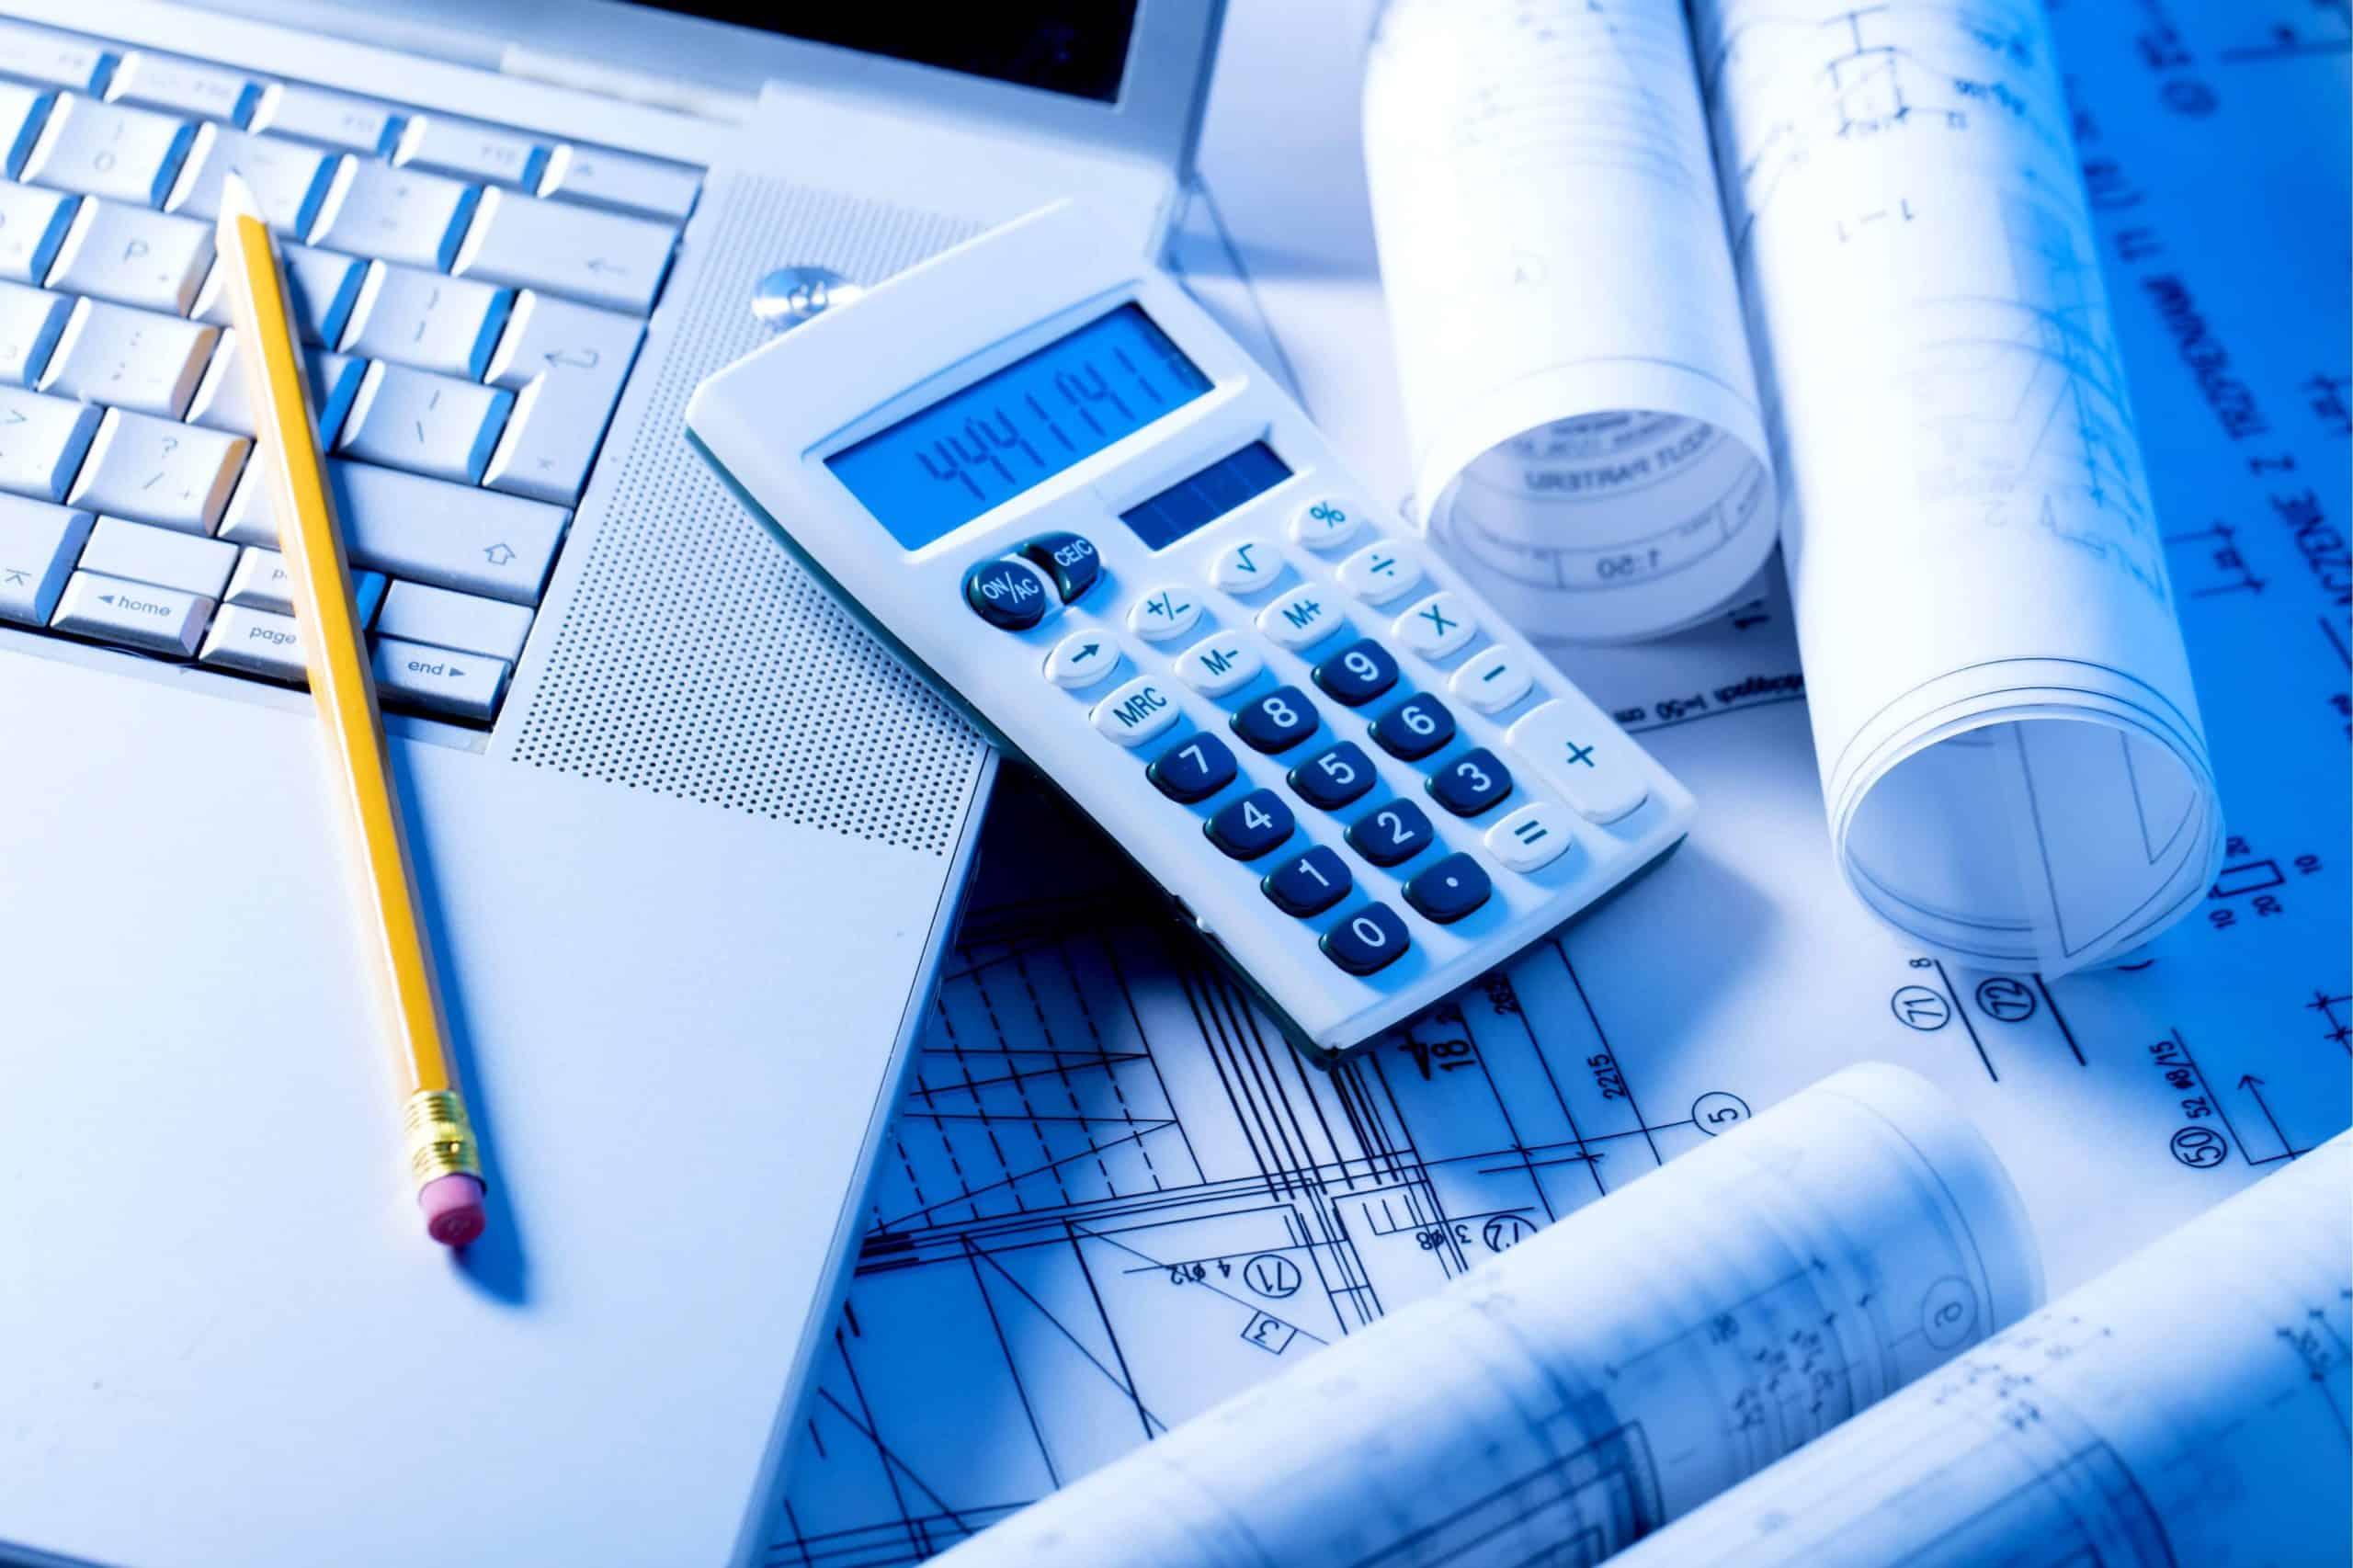 construction business tips, construction tips for home makers, homemaking tips for entrepreneurs